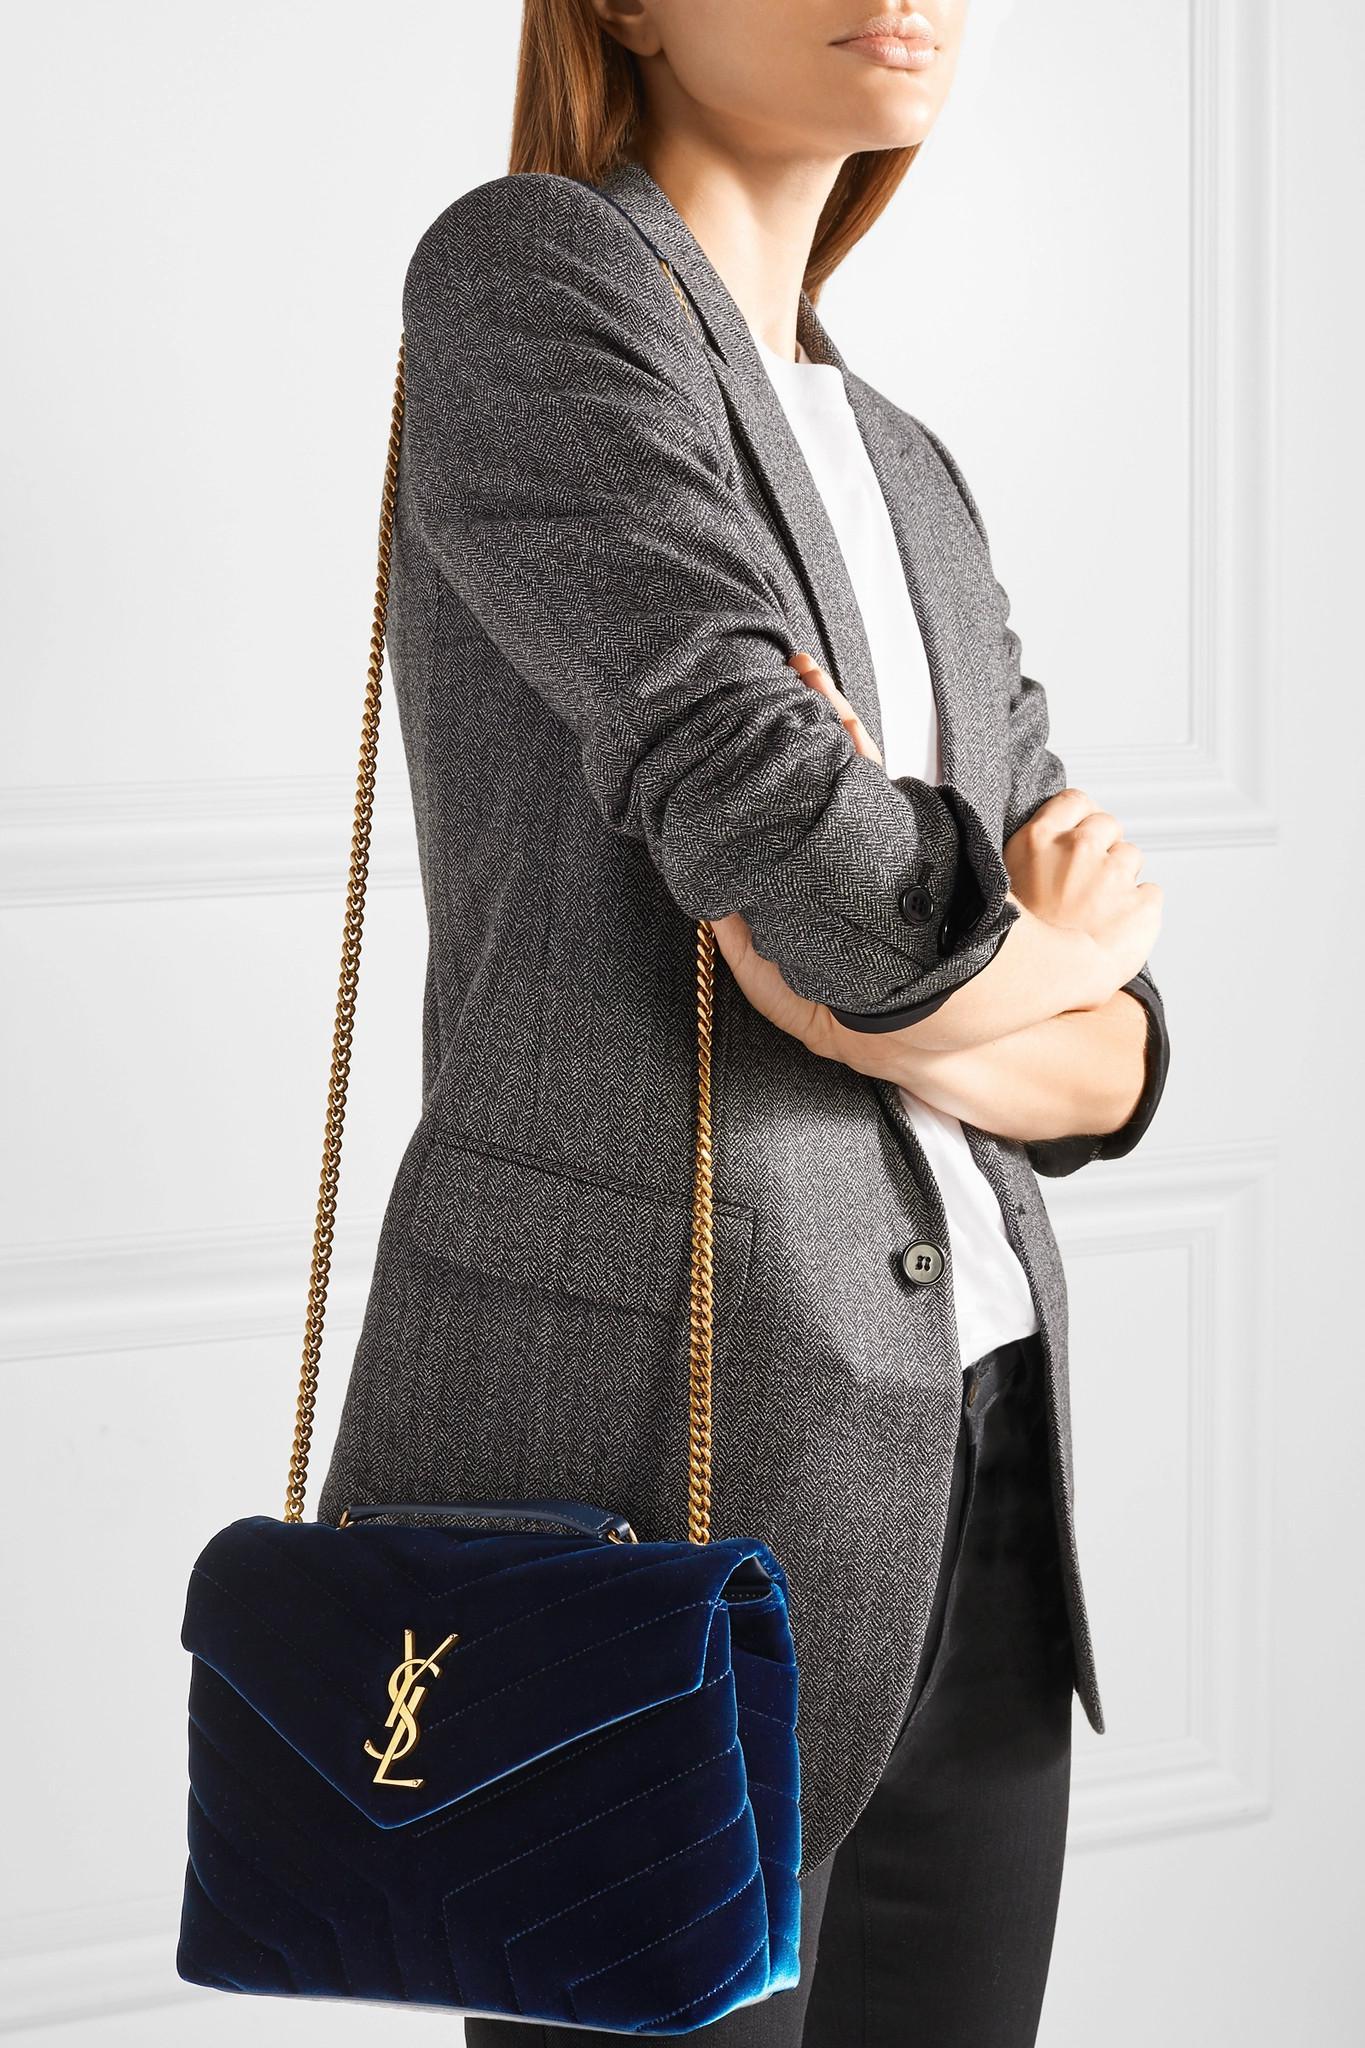 cd63fb209b Lyst - Saint Laurent Loulou Small Quilted Velvet Shoulder Bag in Blue